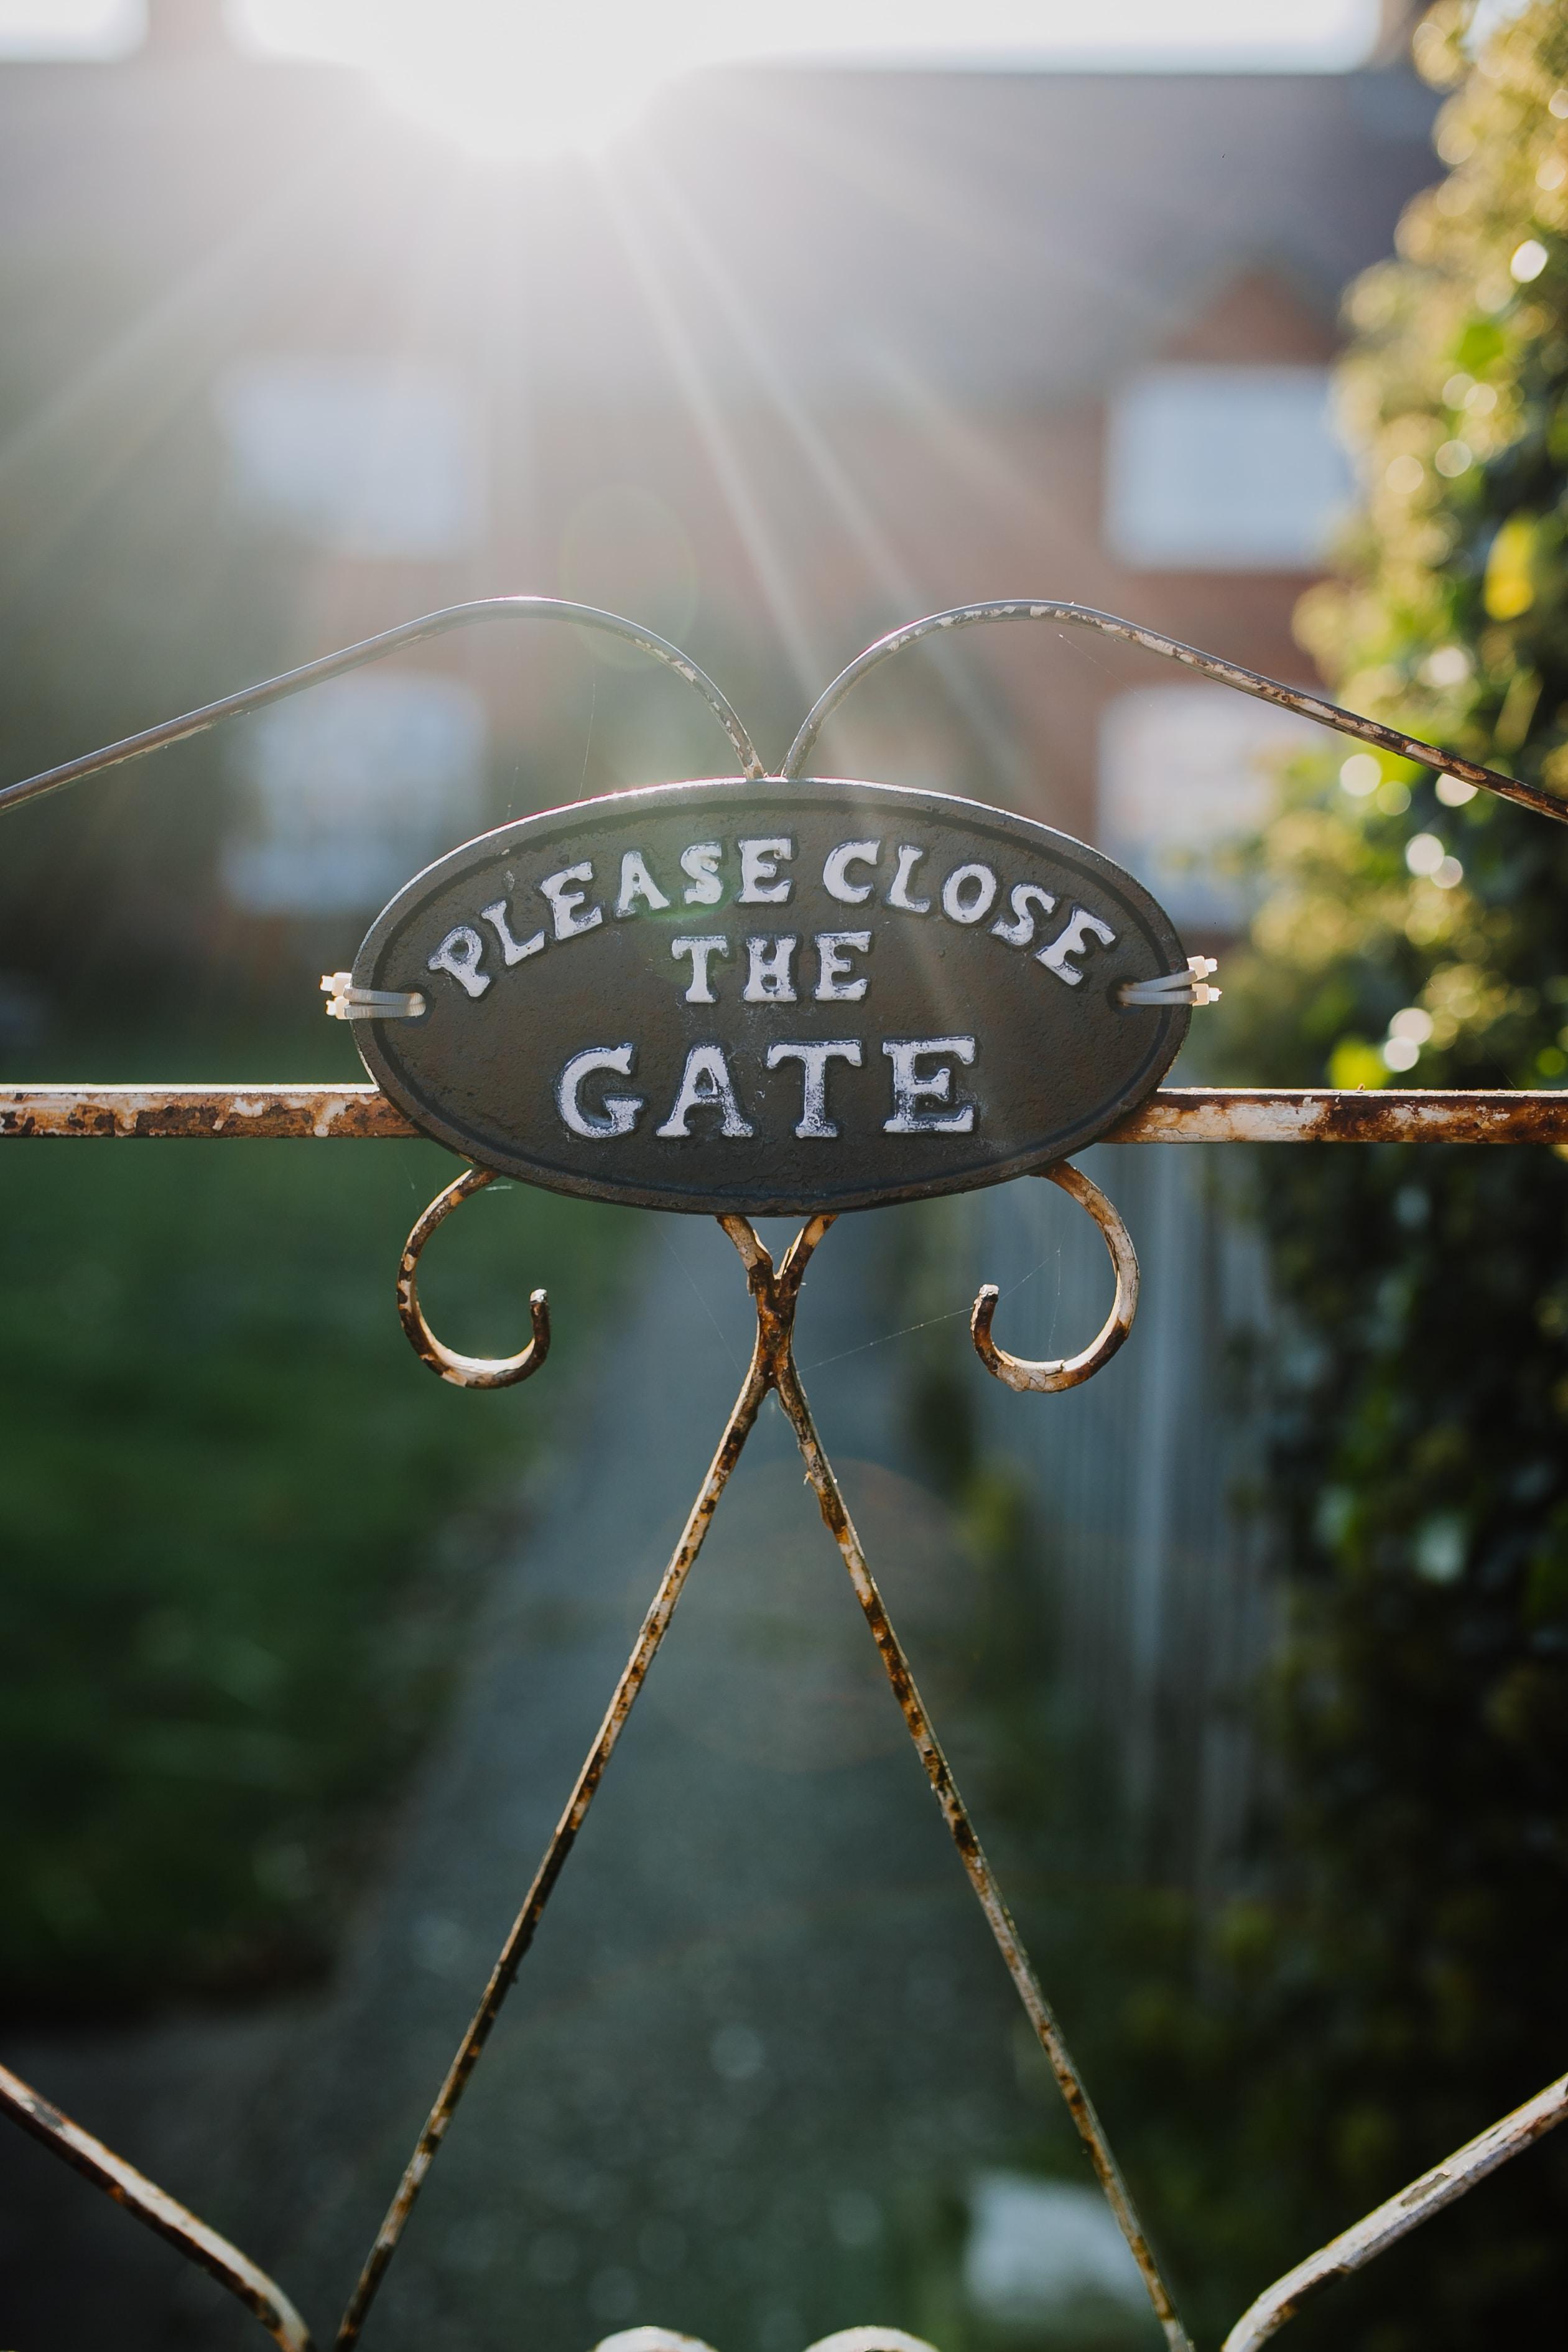 Please Close The Gate sign